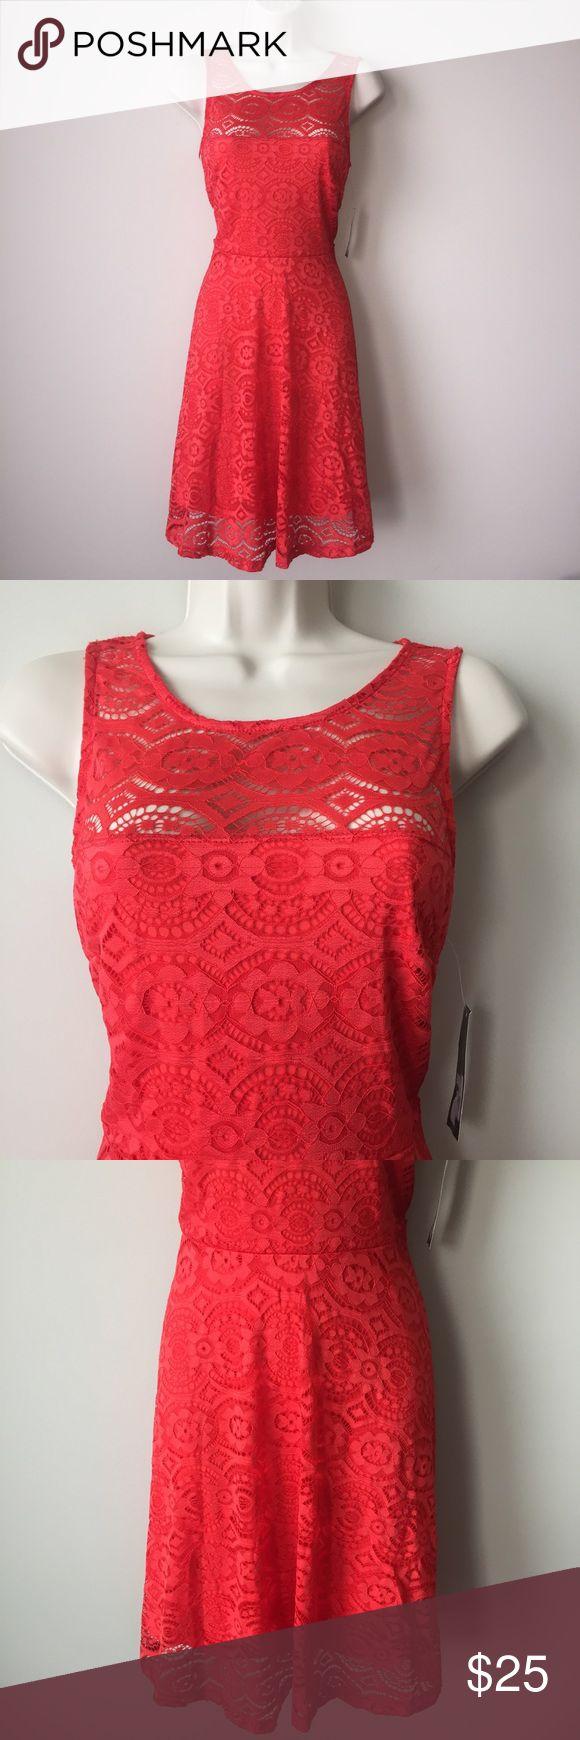 Thalia Sodi orange lace dress New with tags. Us size small. Color: Orange Thalia Sodi Dresses Midi